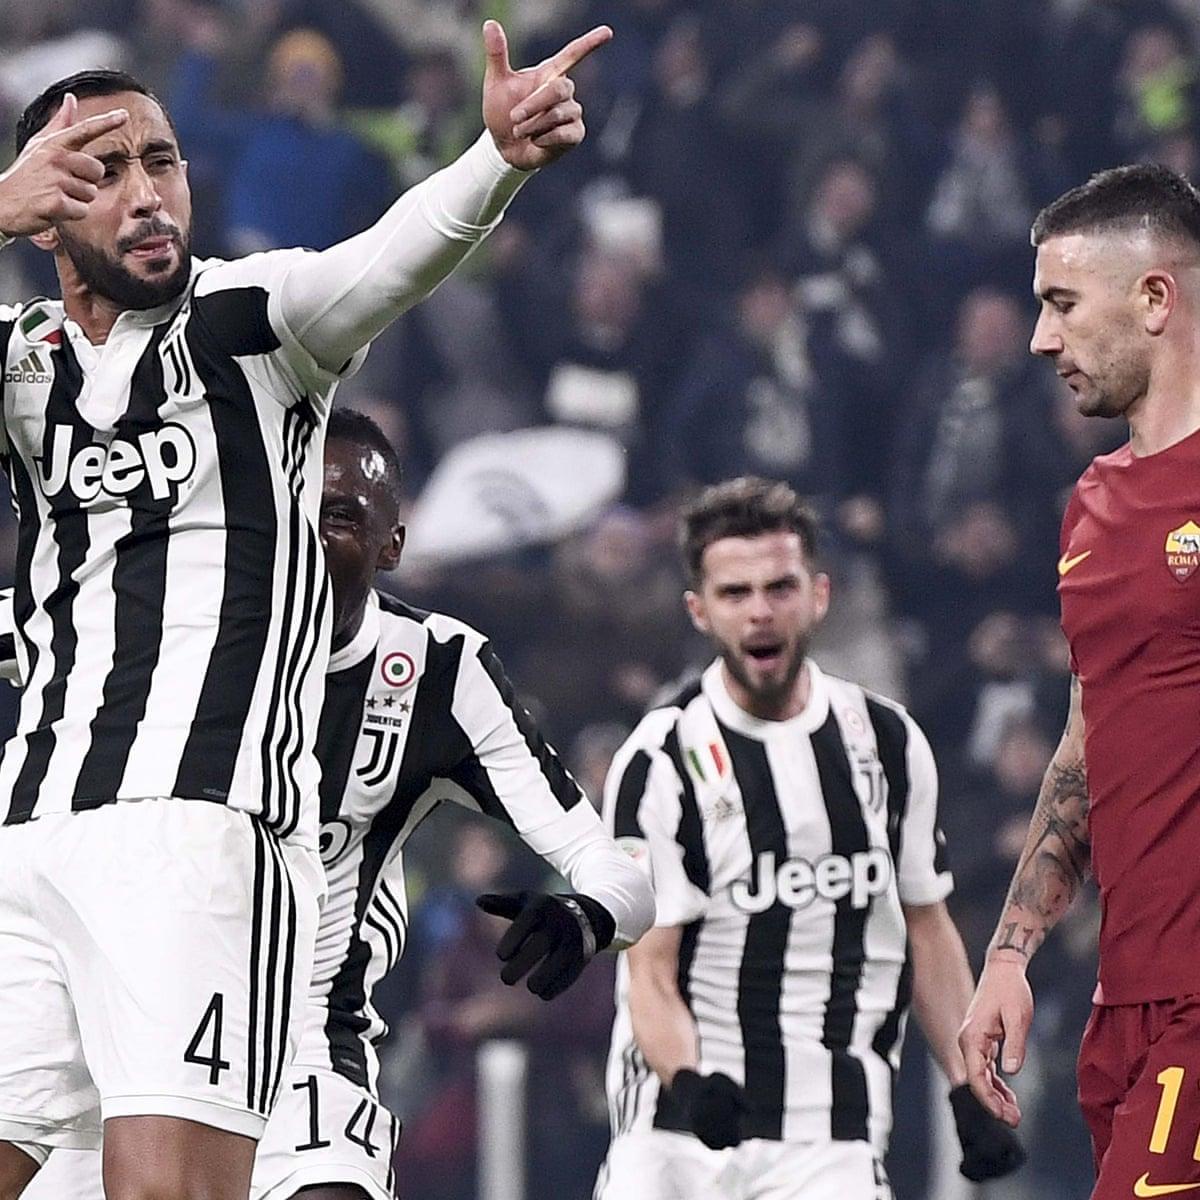 Juventus Buon Natale.Benatia Celebrates In Style As Juventus Win To Nil Yet Again Juventus The Guardian